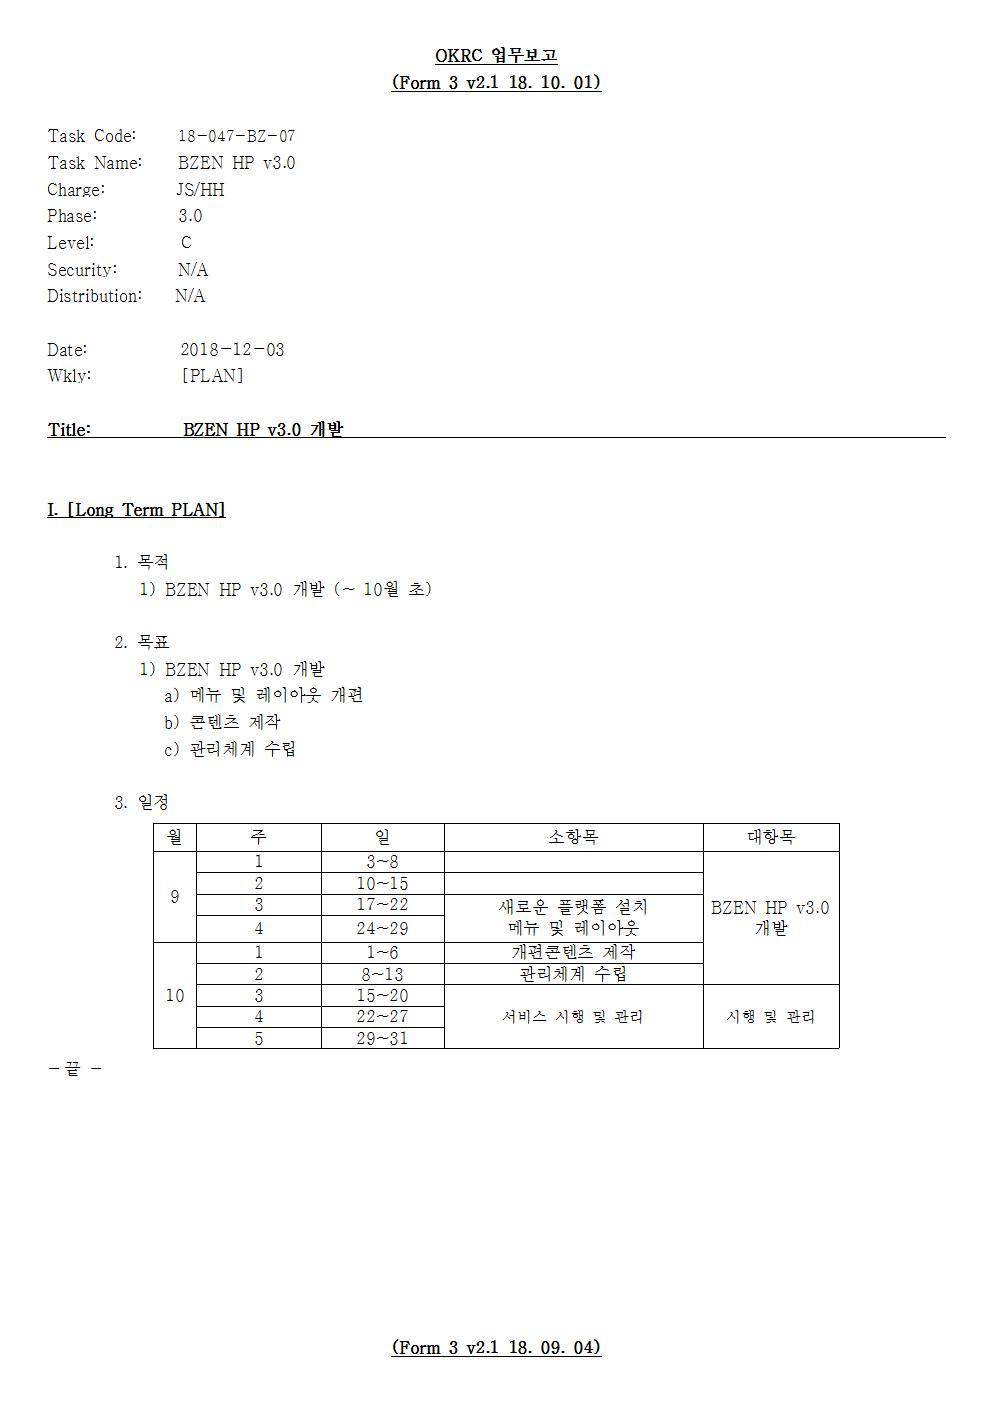 D-[18-047-BZ-07]-[BZEN HP v3.0]-[2018-12-03][HH]001.jpg